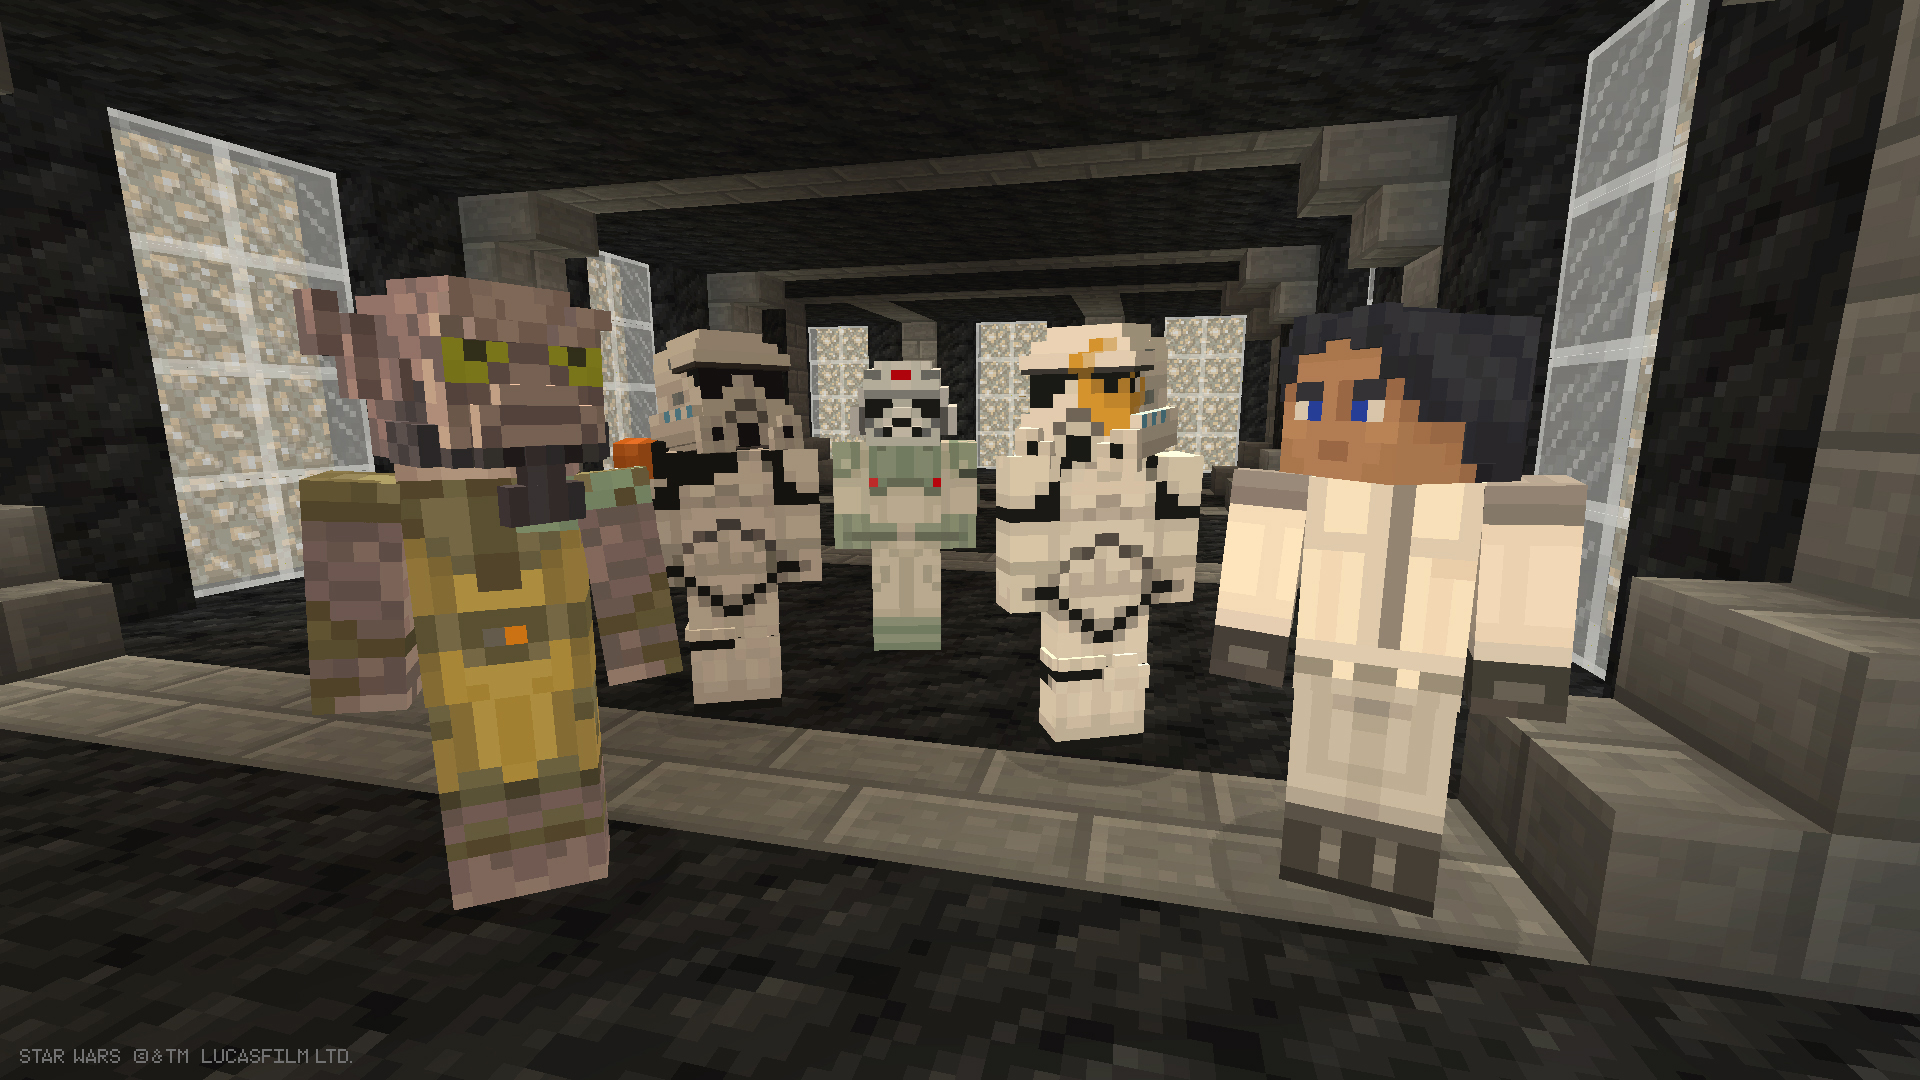 Skin de Star Wars Rebels chega ao Minecraft - Cast Wars